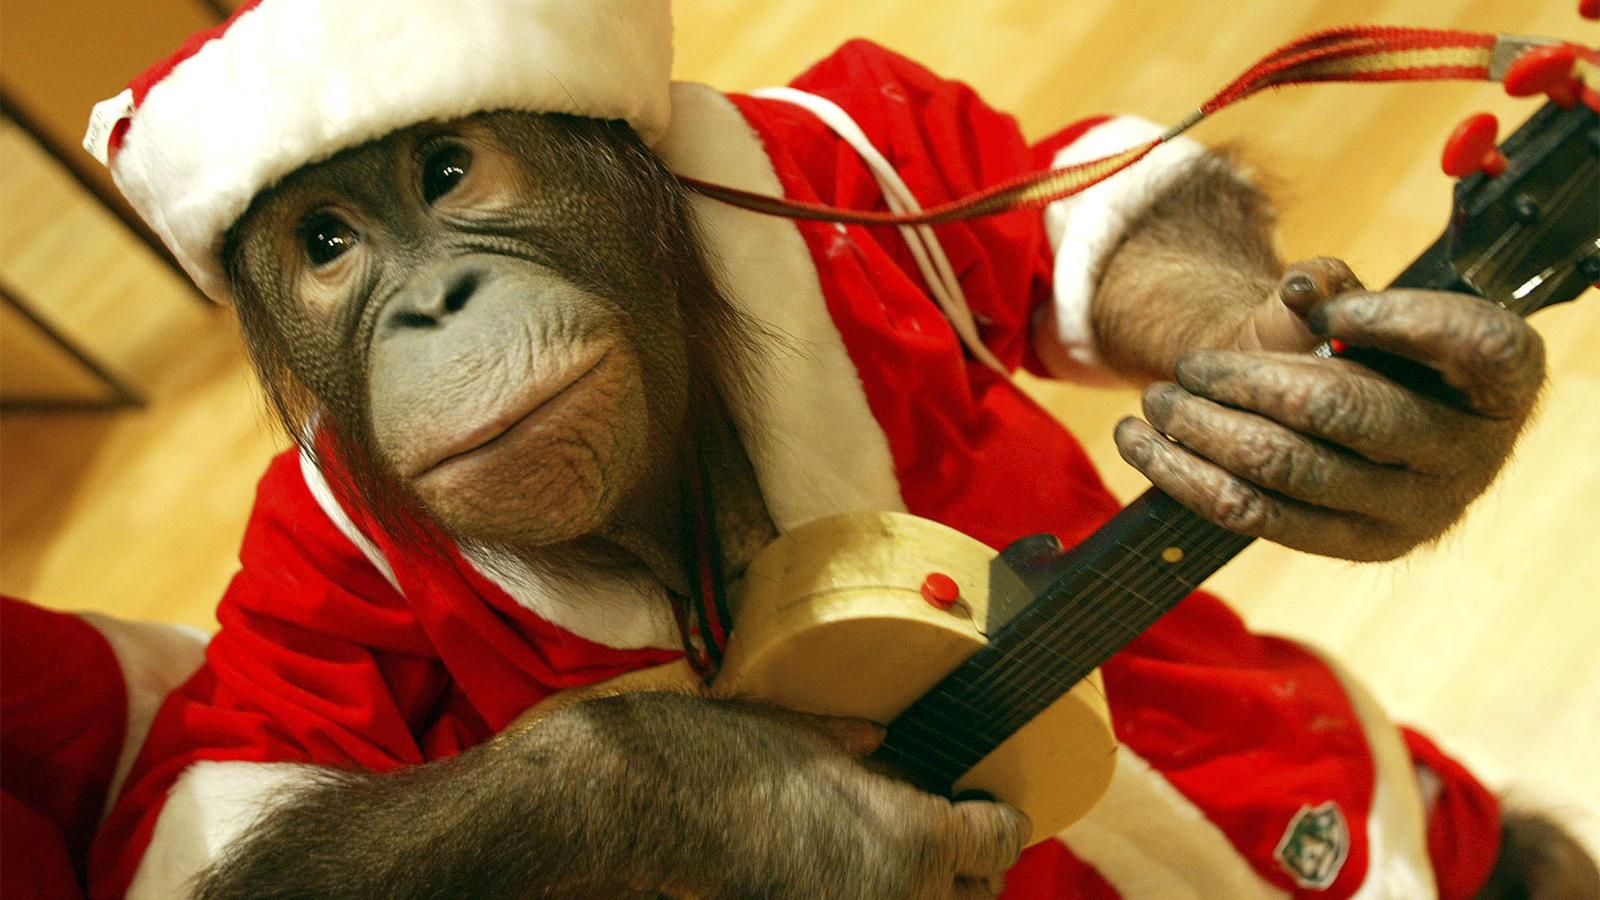 6 Reasons Monkeys Should Never Be Pets | HowStuffWorks